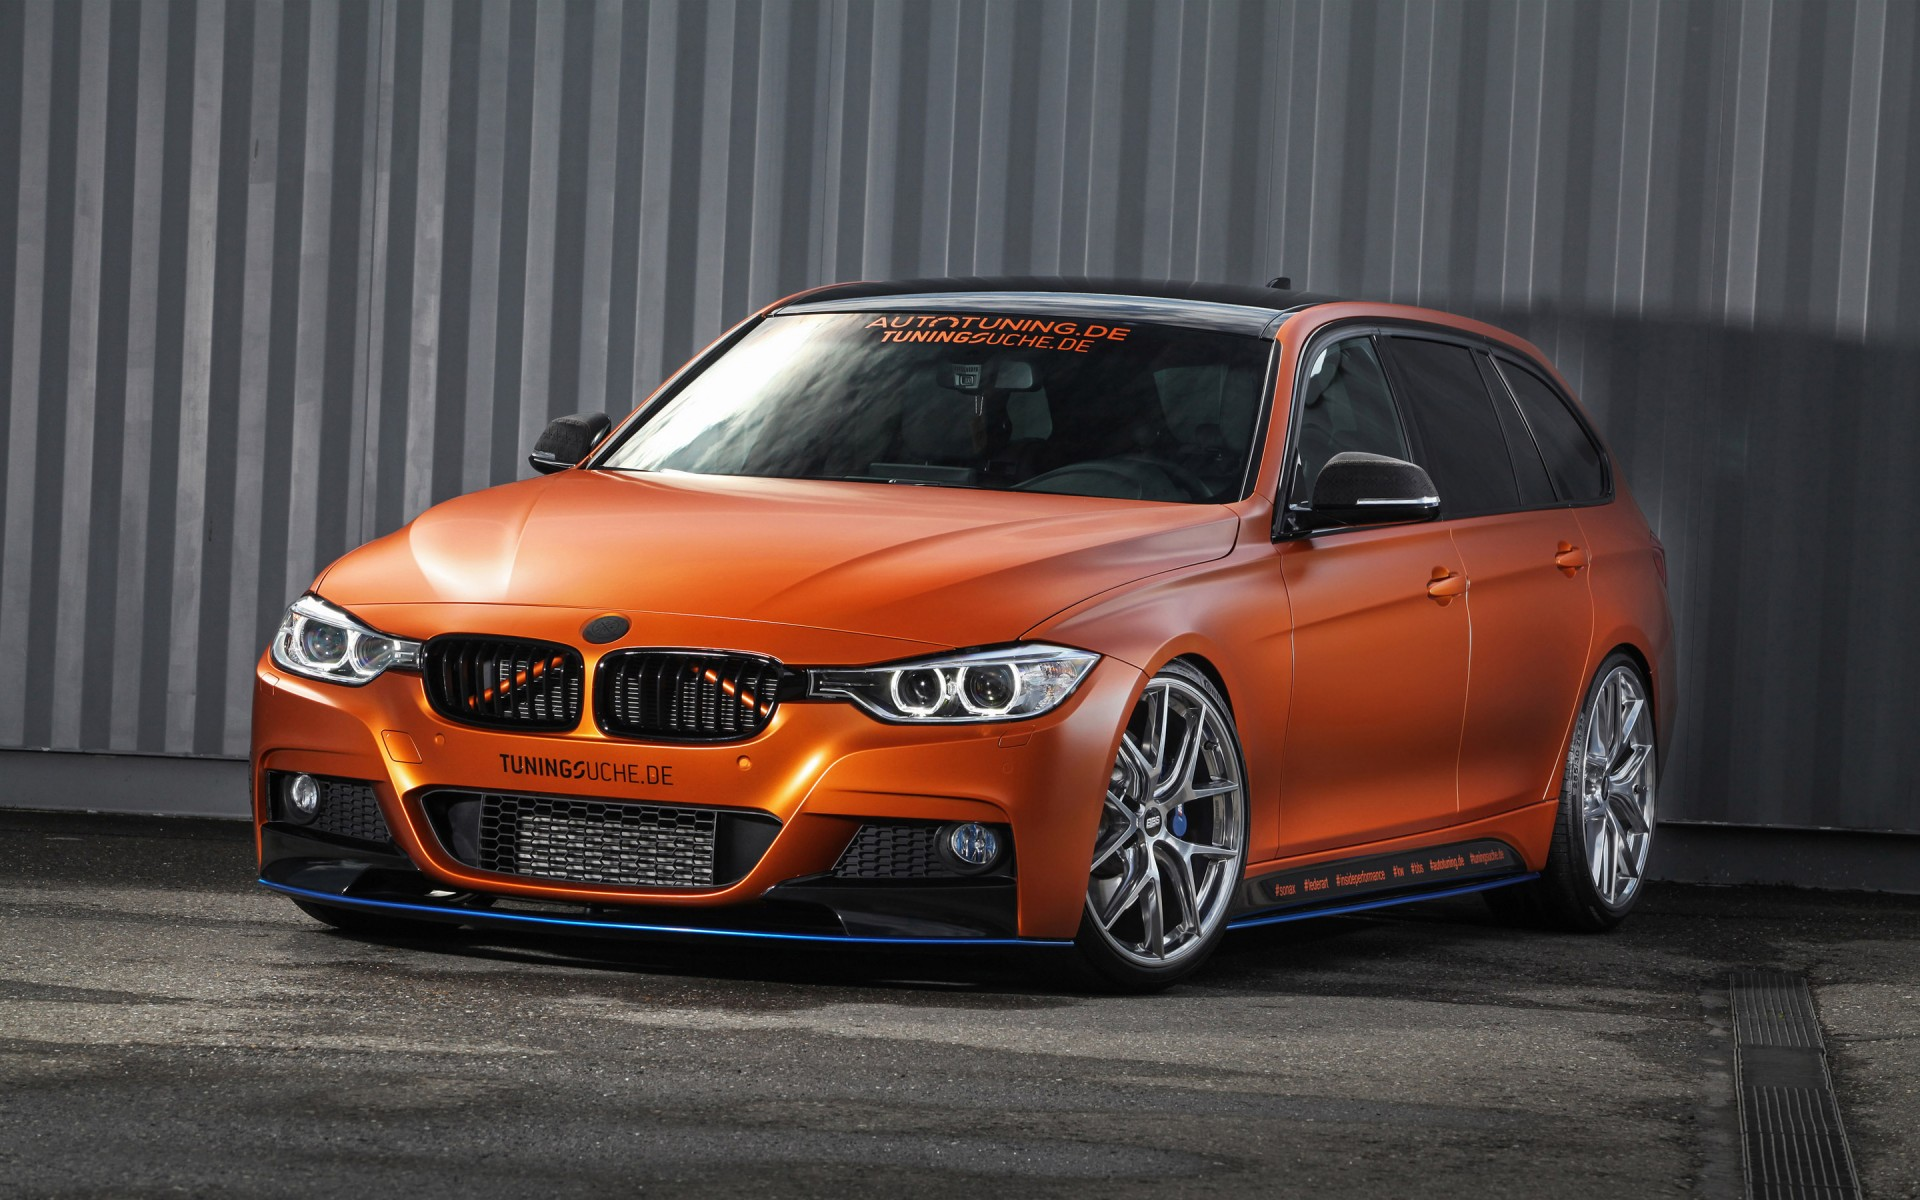 2016 tuningsuche BMW 328i Rouring F31 Wallpaper | HD Car ...